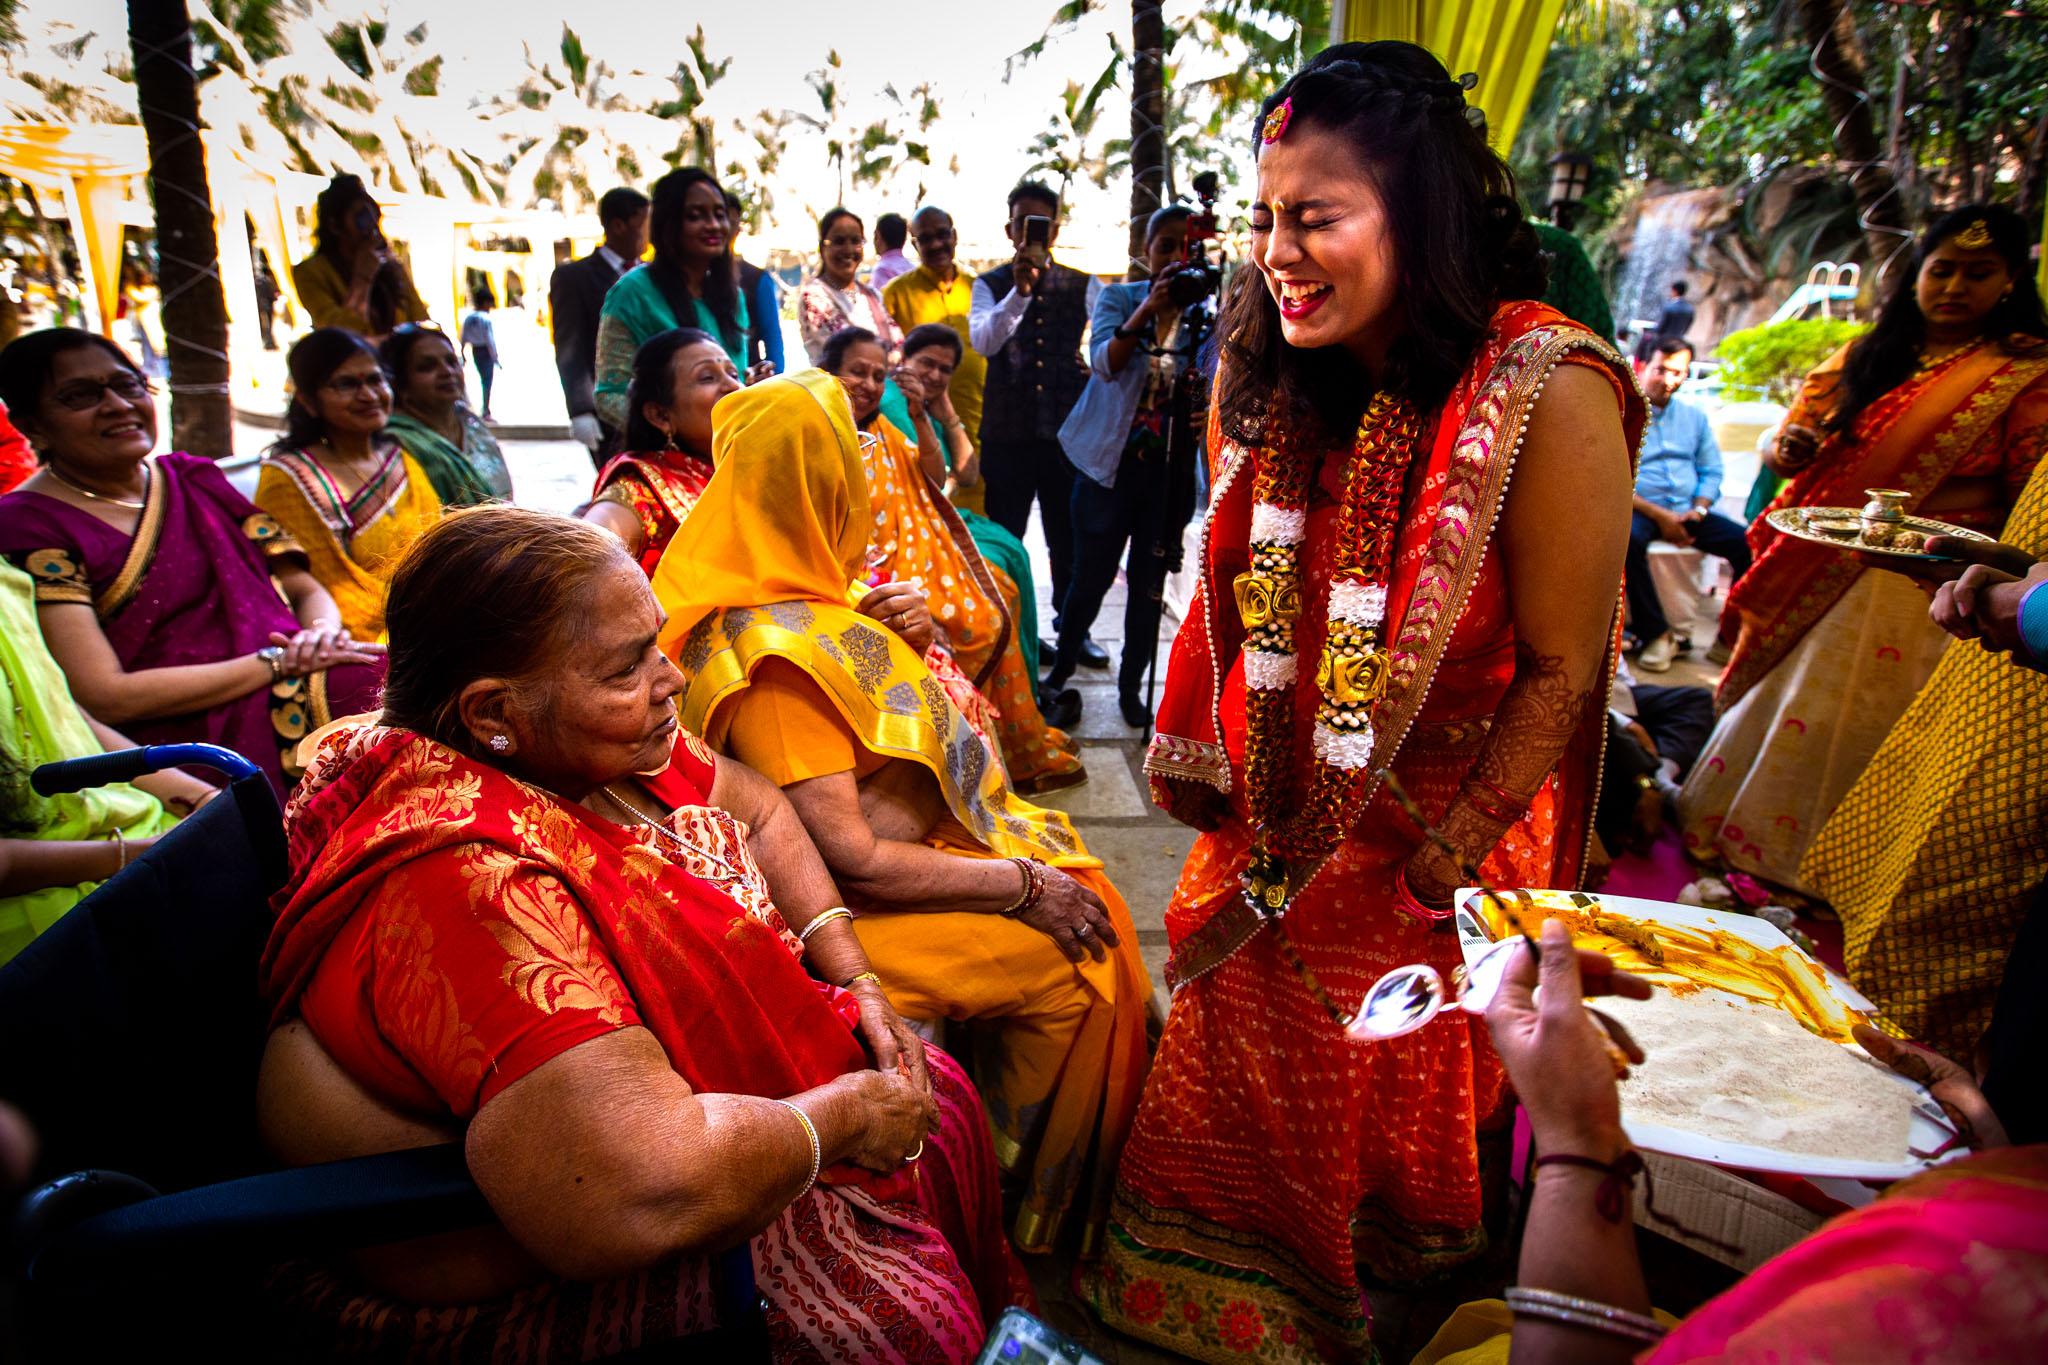 Mukti x Ojas Wedding Akshjay Sansare Photography Best wedding photographer in mumbai India Candid Cinematic Films videos-6.jpg